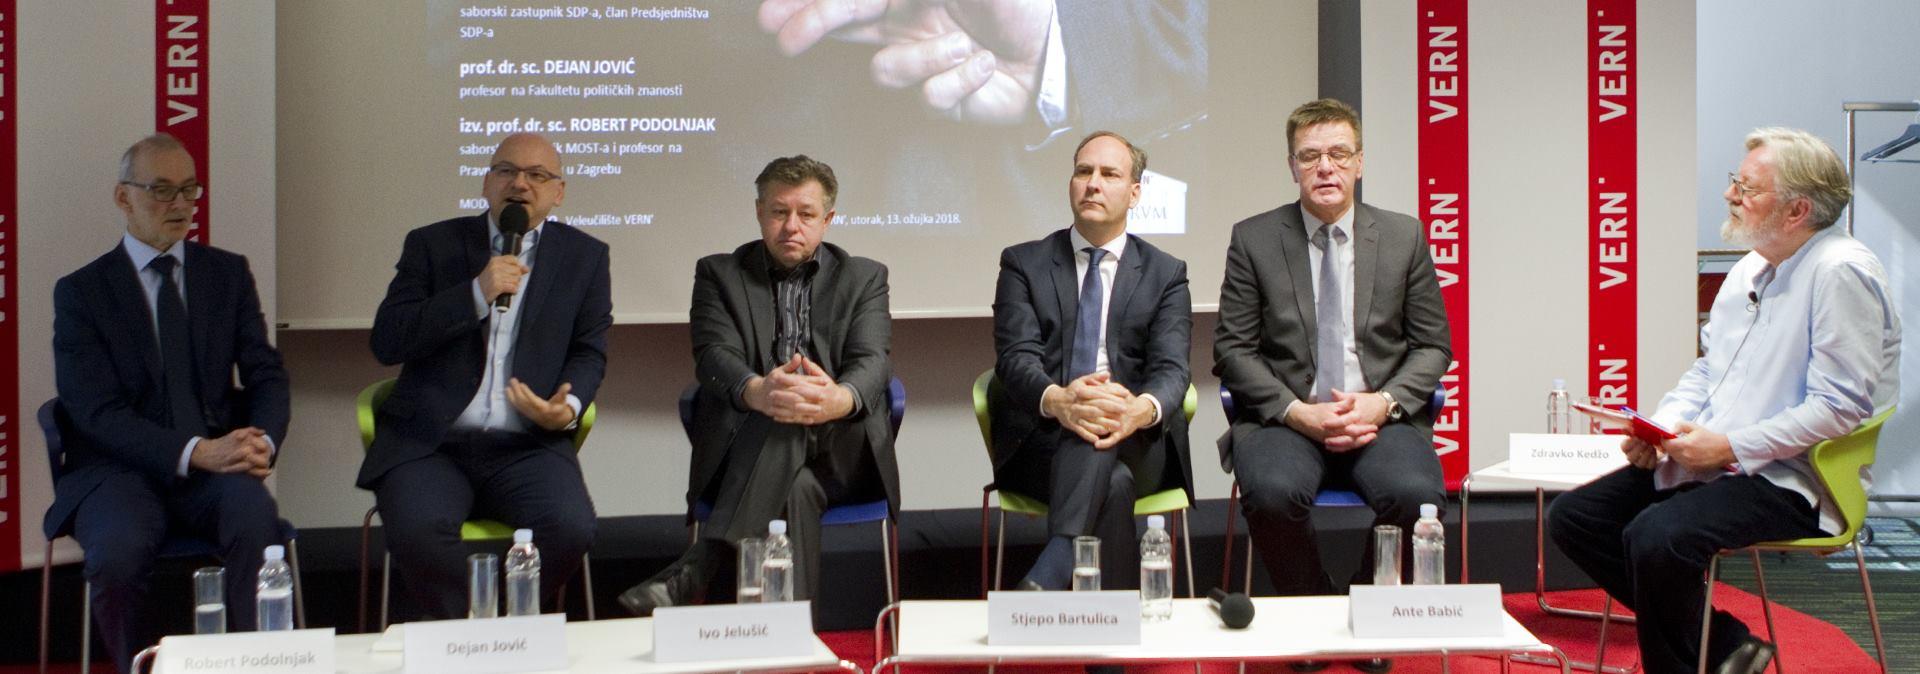 VERN' Održana panel diskusija pod nazivom 'Politika i moral'